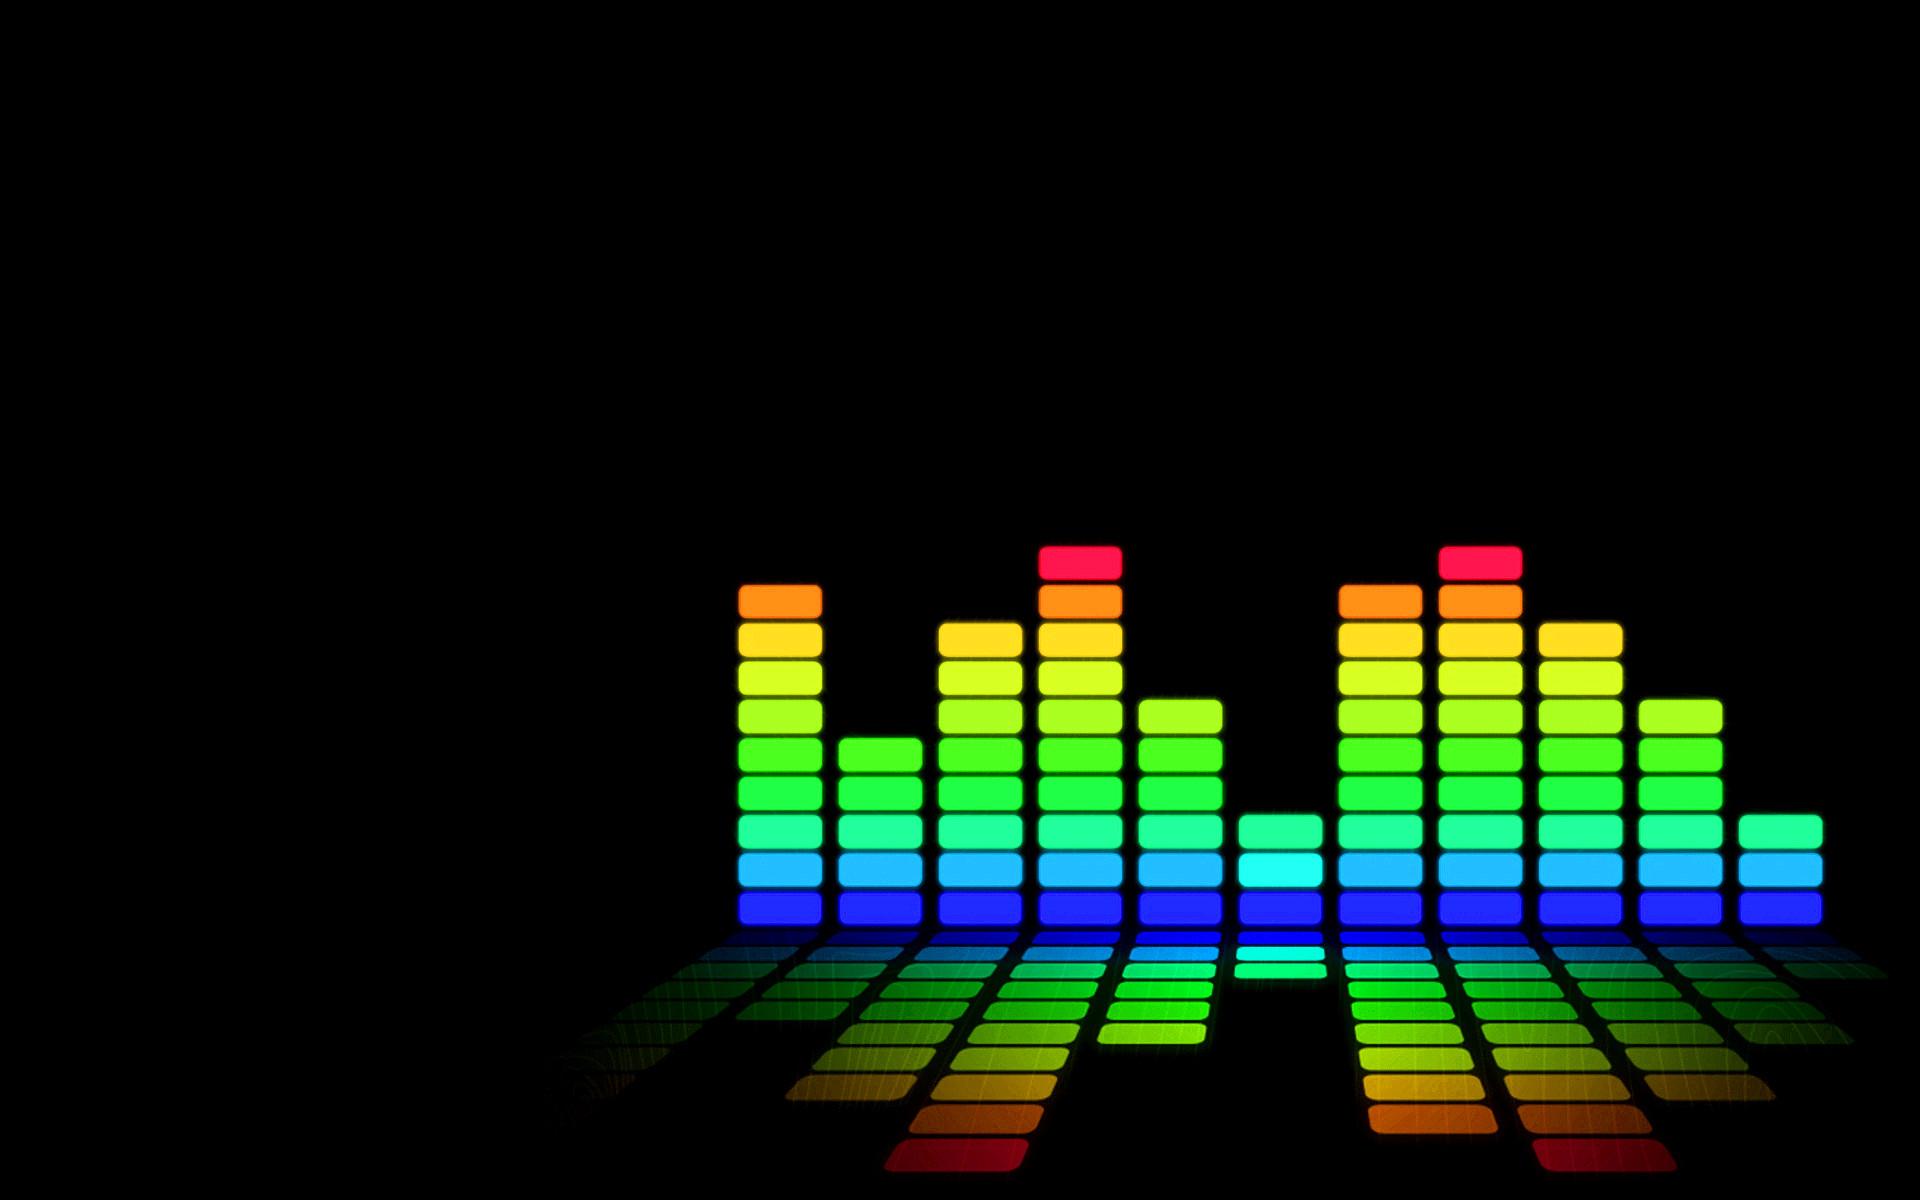 Free cool desktop images Music graphics Pinterest